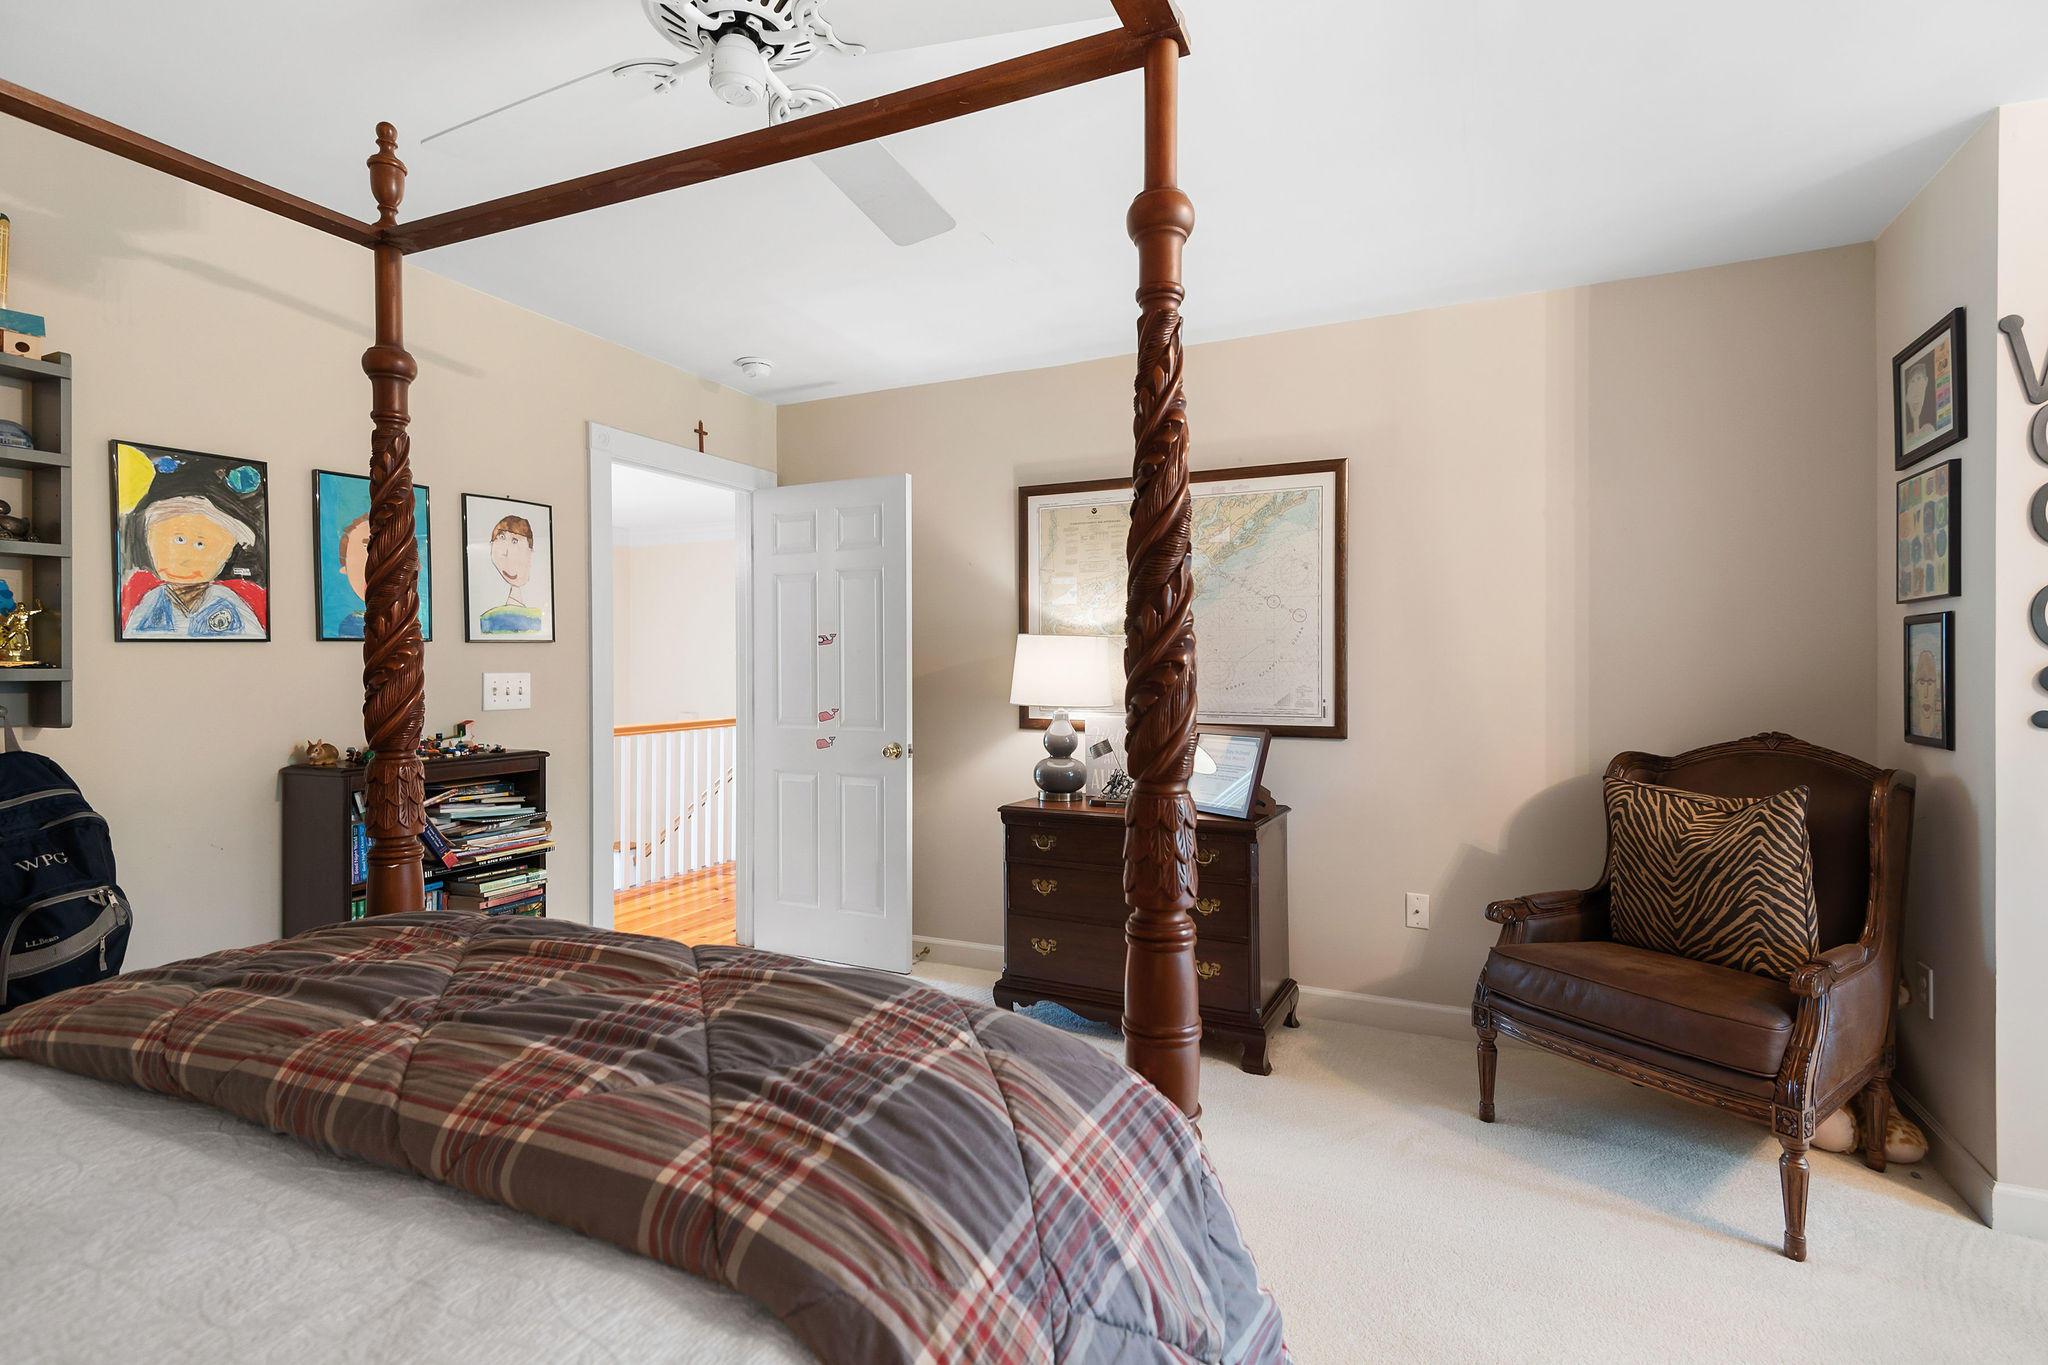 Country Club II Homes For Sale - 1482 Burningtree, Charleston, SC - 24